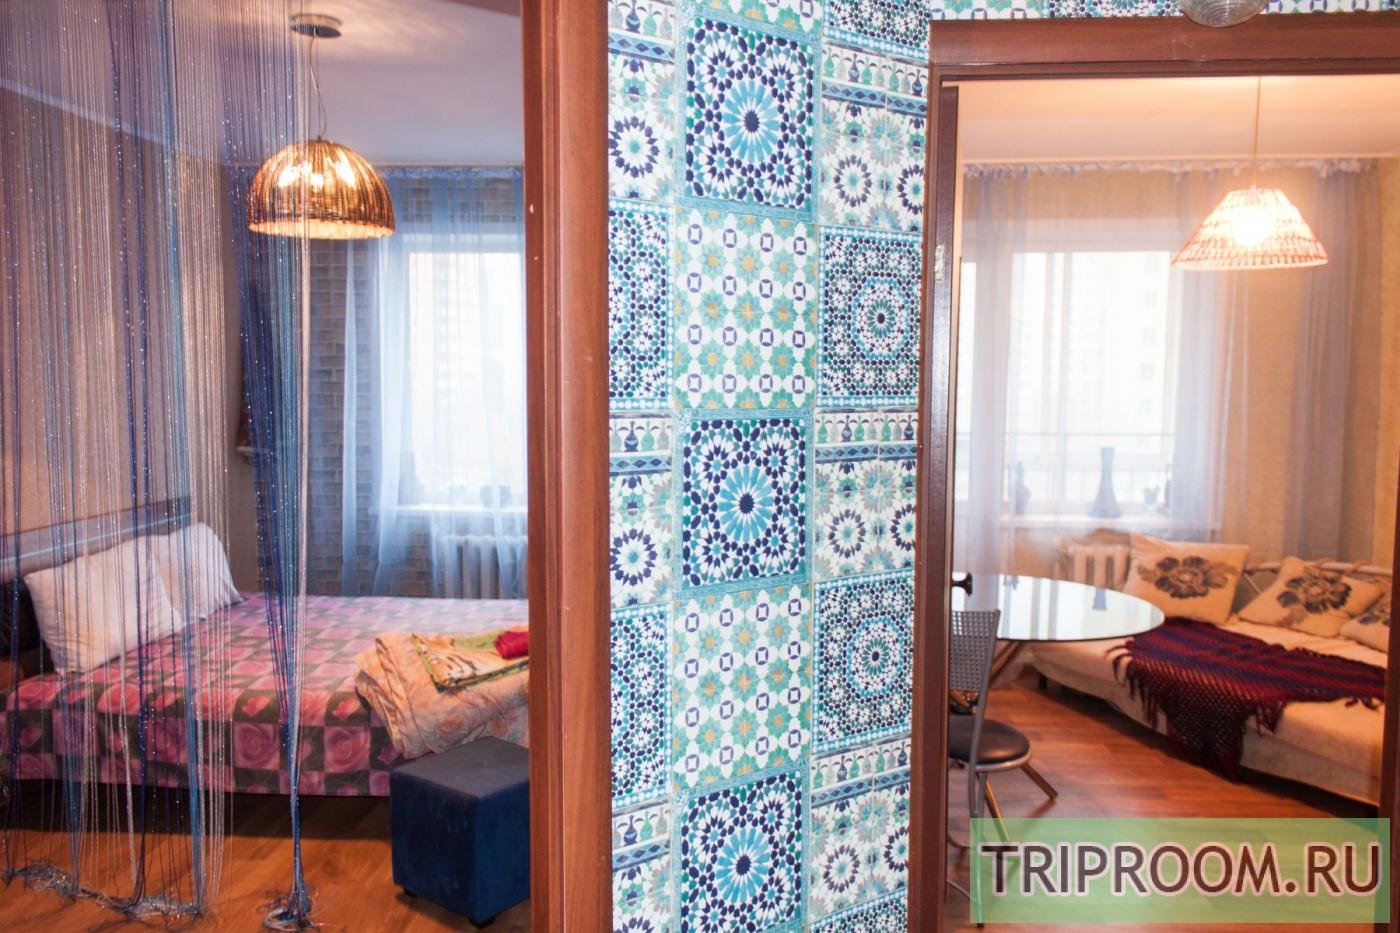 1-комнатная квартира посуточно (вариант № 34813), ул. Механошина улица, фото № 2